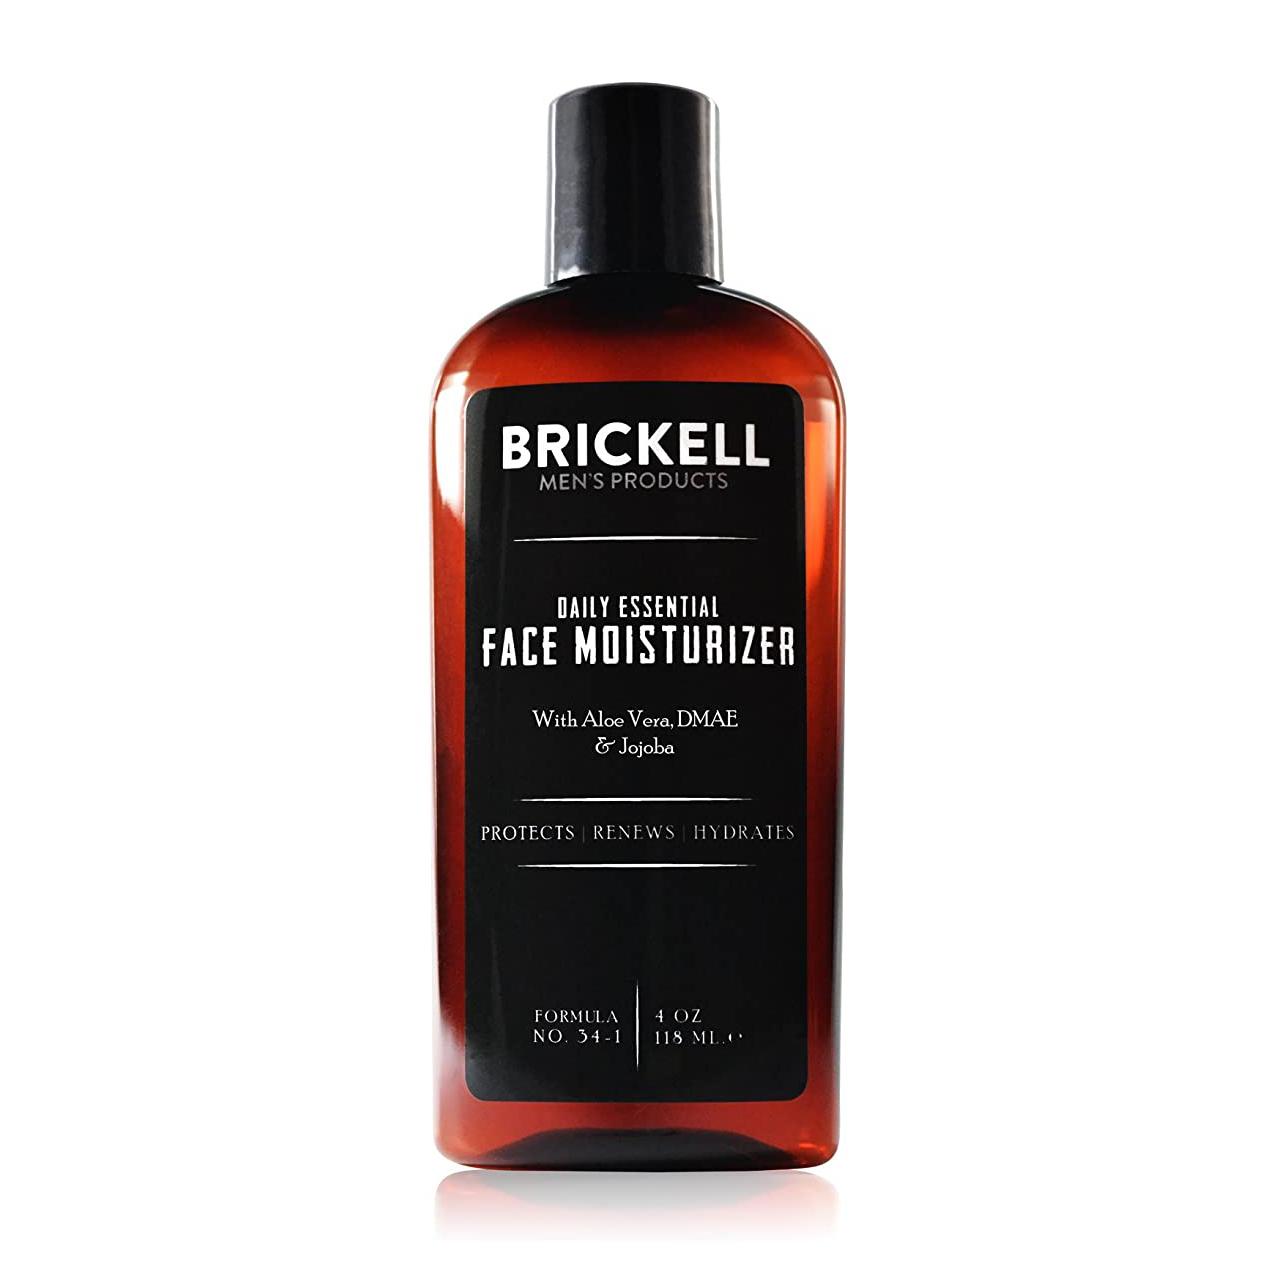 Brickell Men's Daily Essential Face Moisturizer